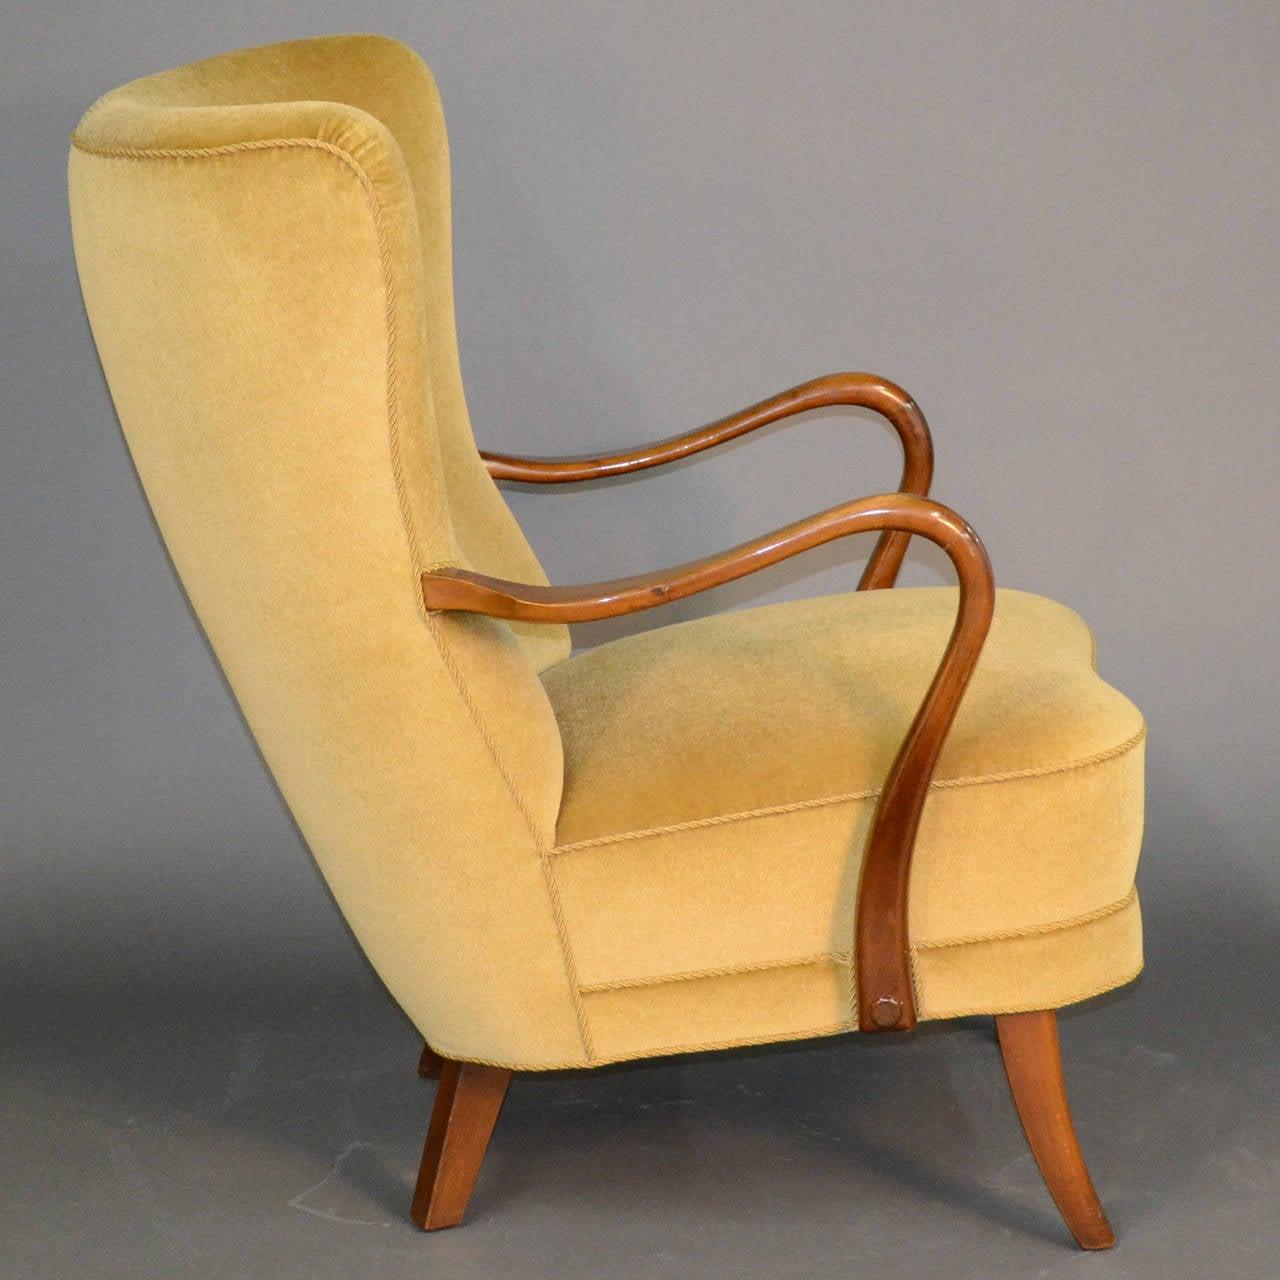 1940s Danish Modern Lounge Chair at 1stdibs